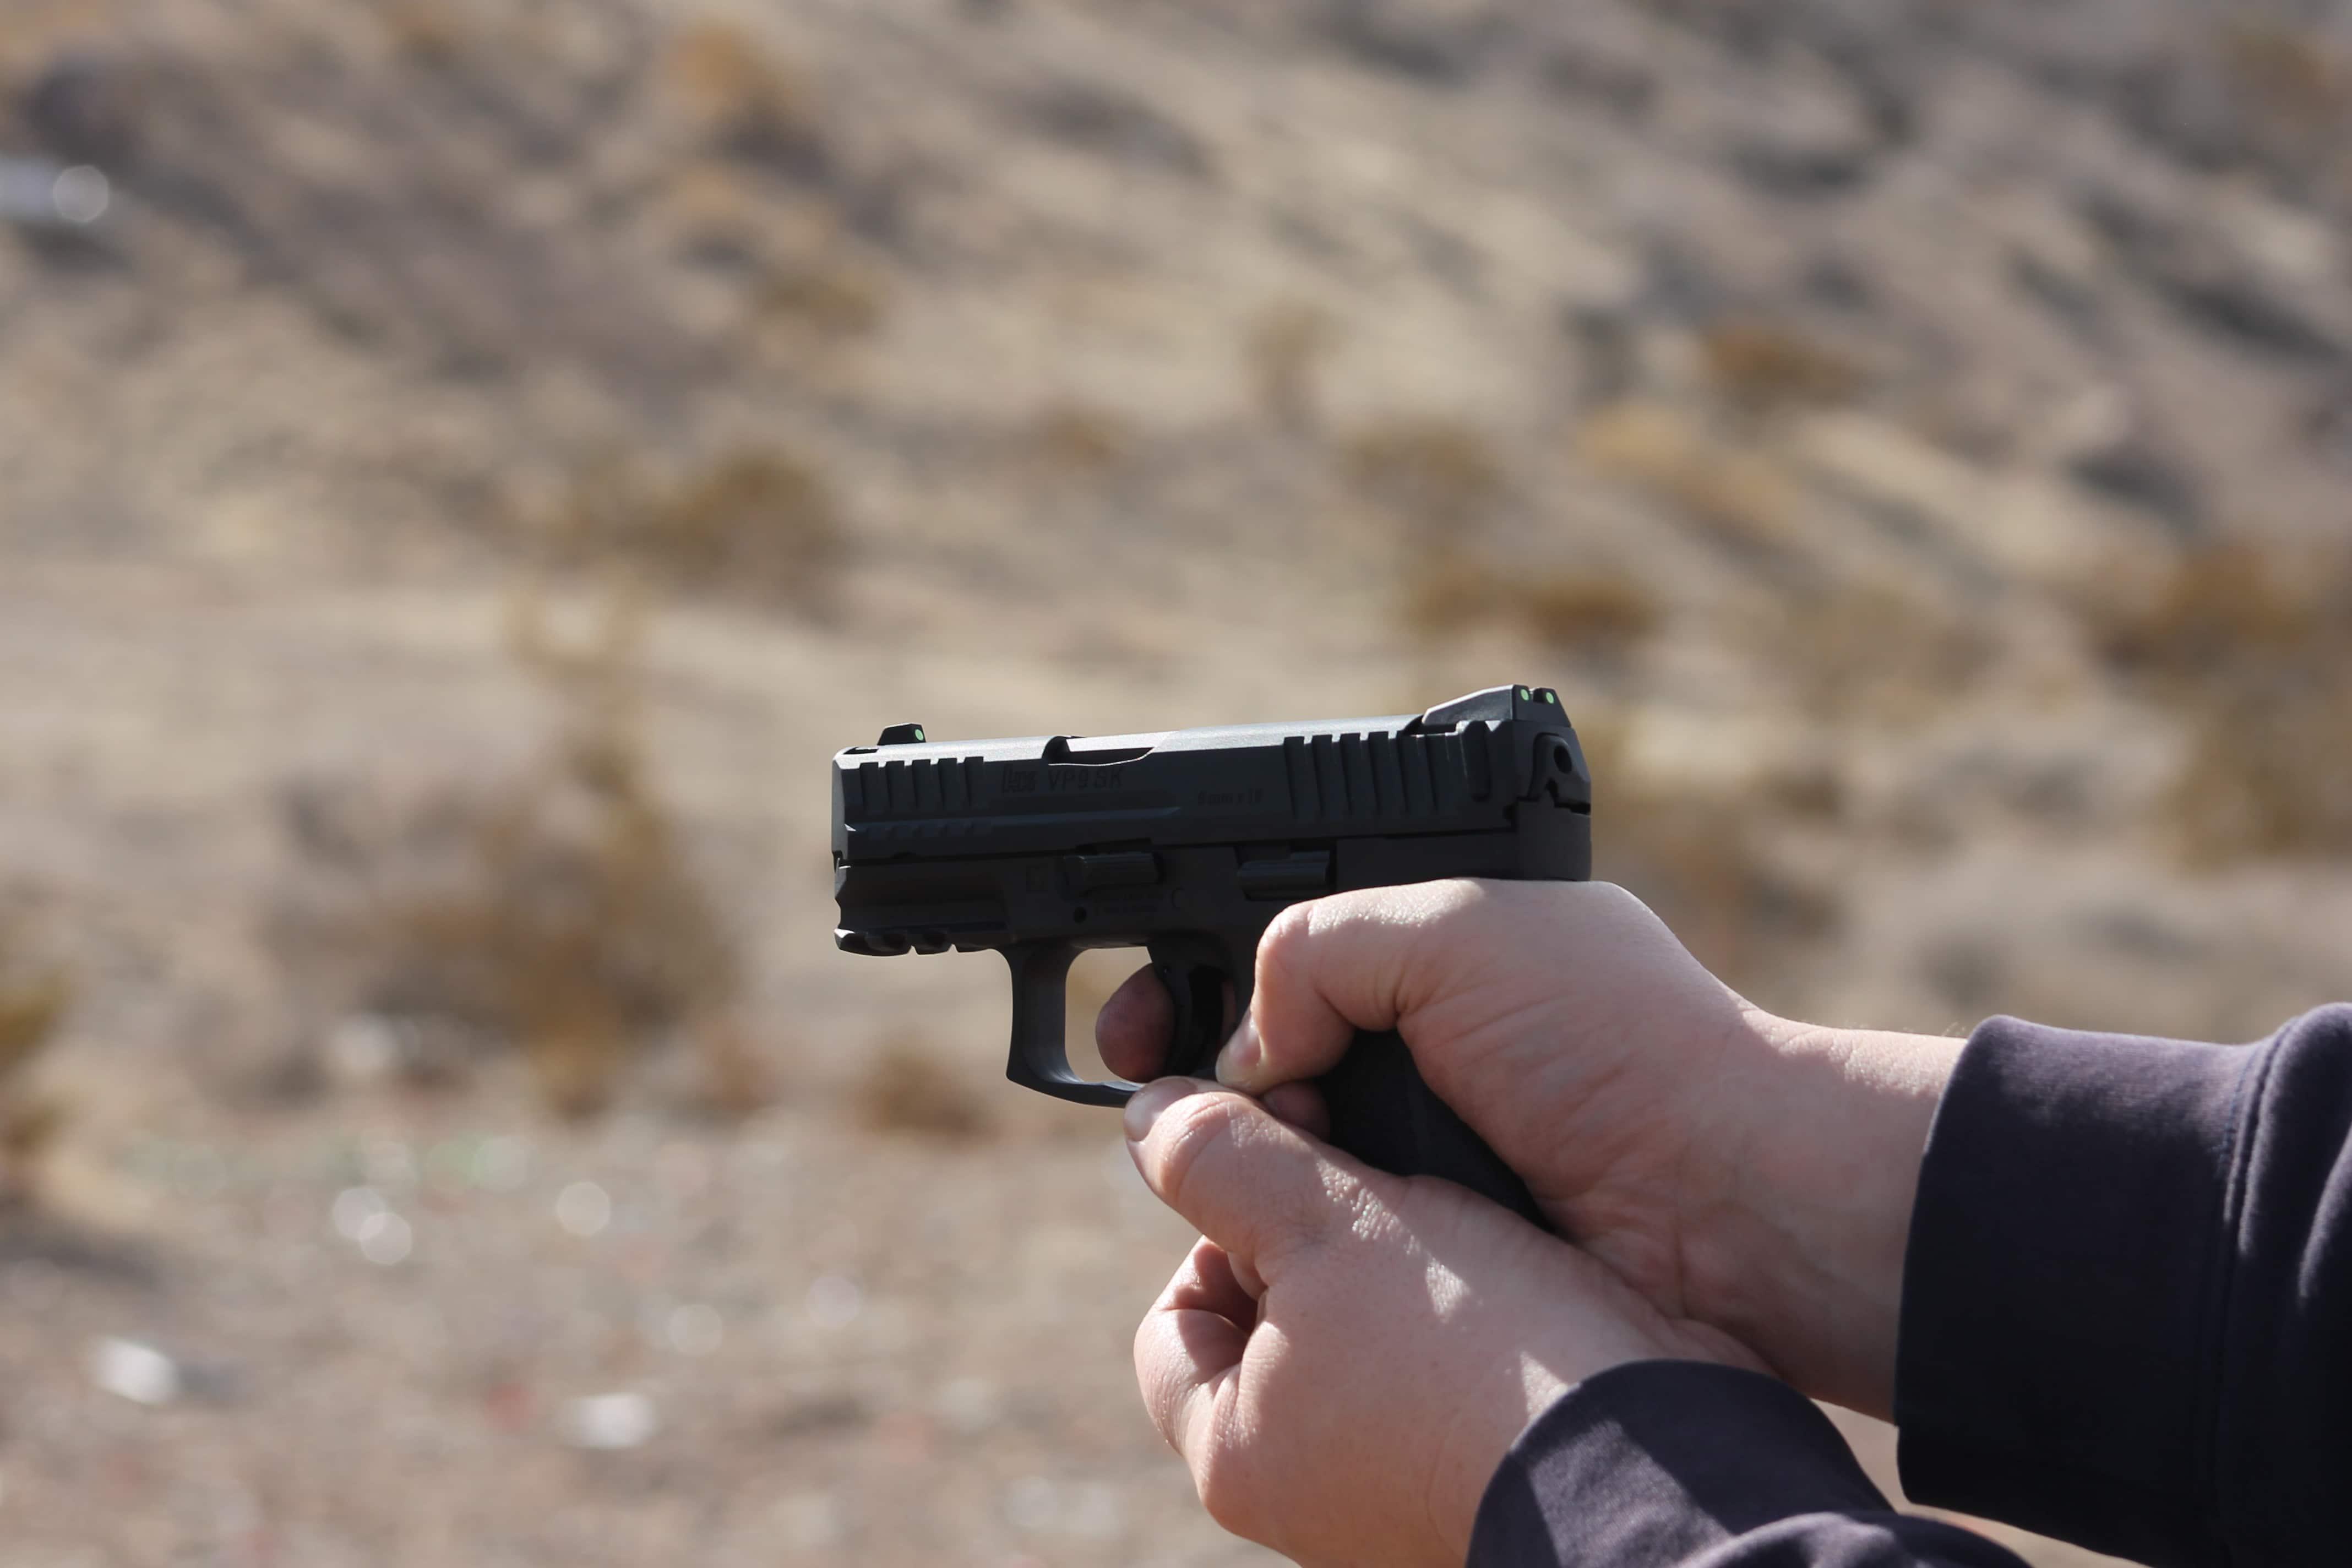 HK VP9 vs Glock 19 – Is The New Heckler & Koch A Viable Glock Alternative?